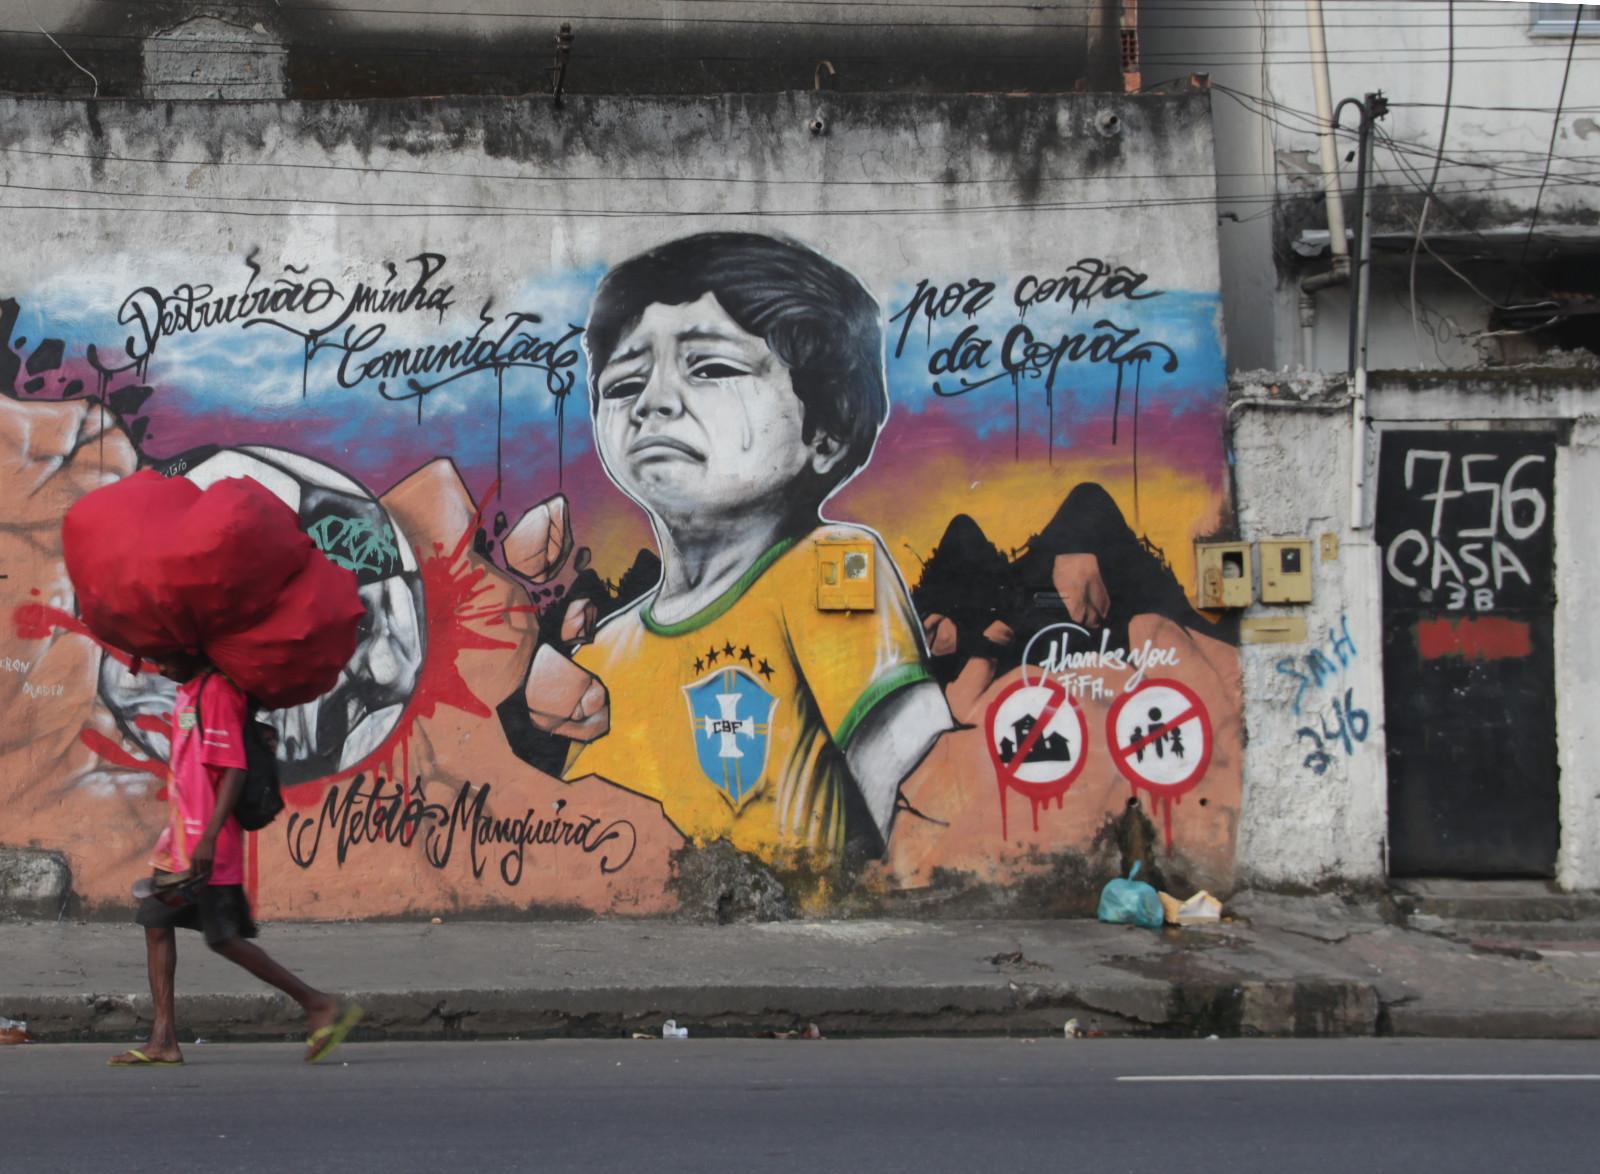 Graffiti in der Favela Metro mit Kritik an der Fifa